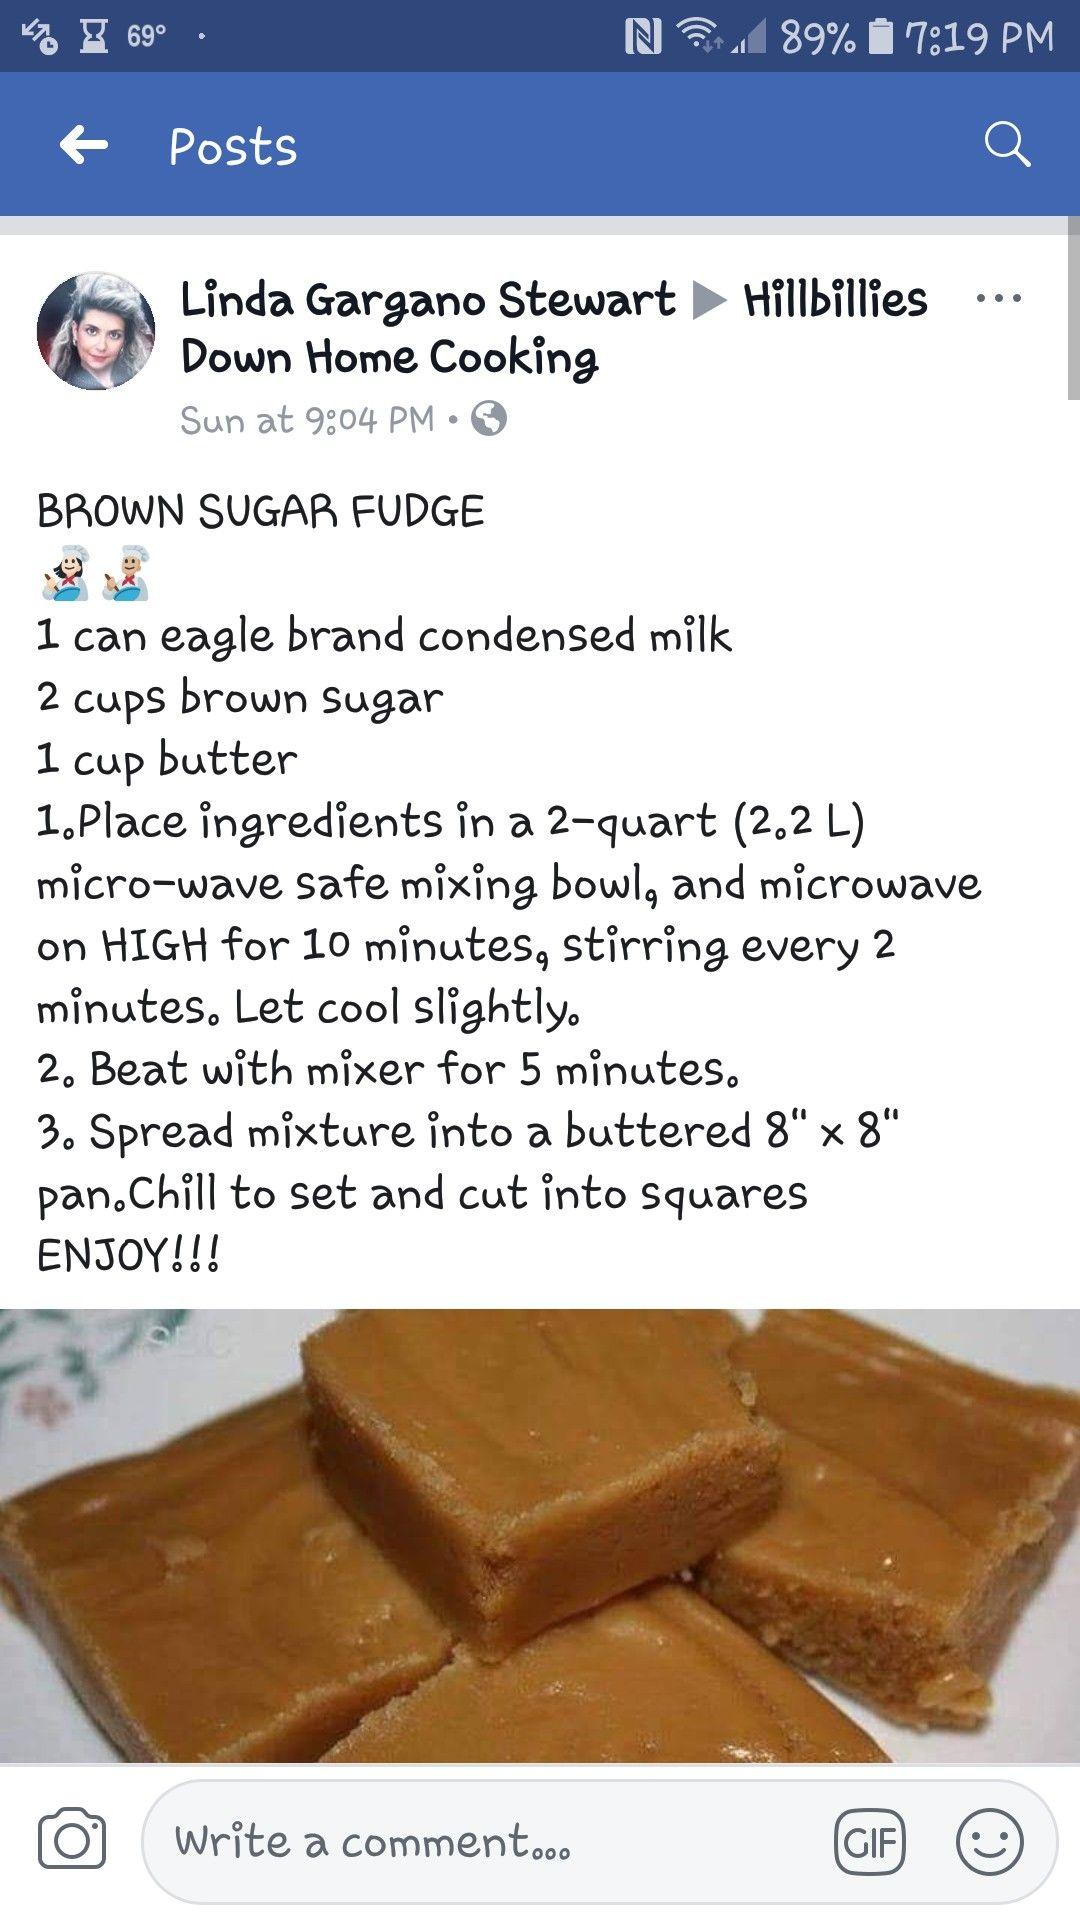 Brown sugar fudge brown sugar fudge fudge with